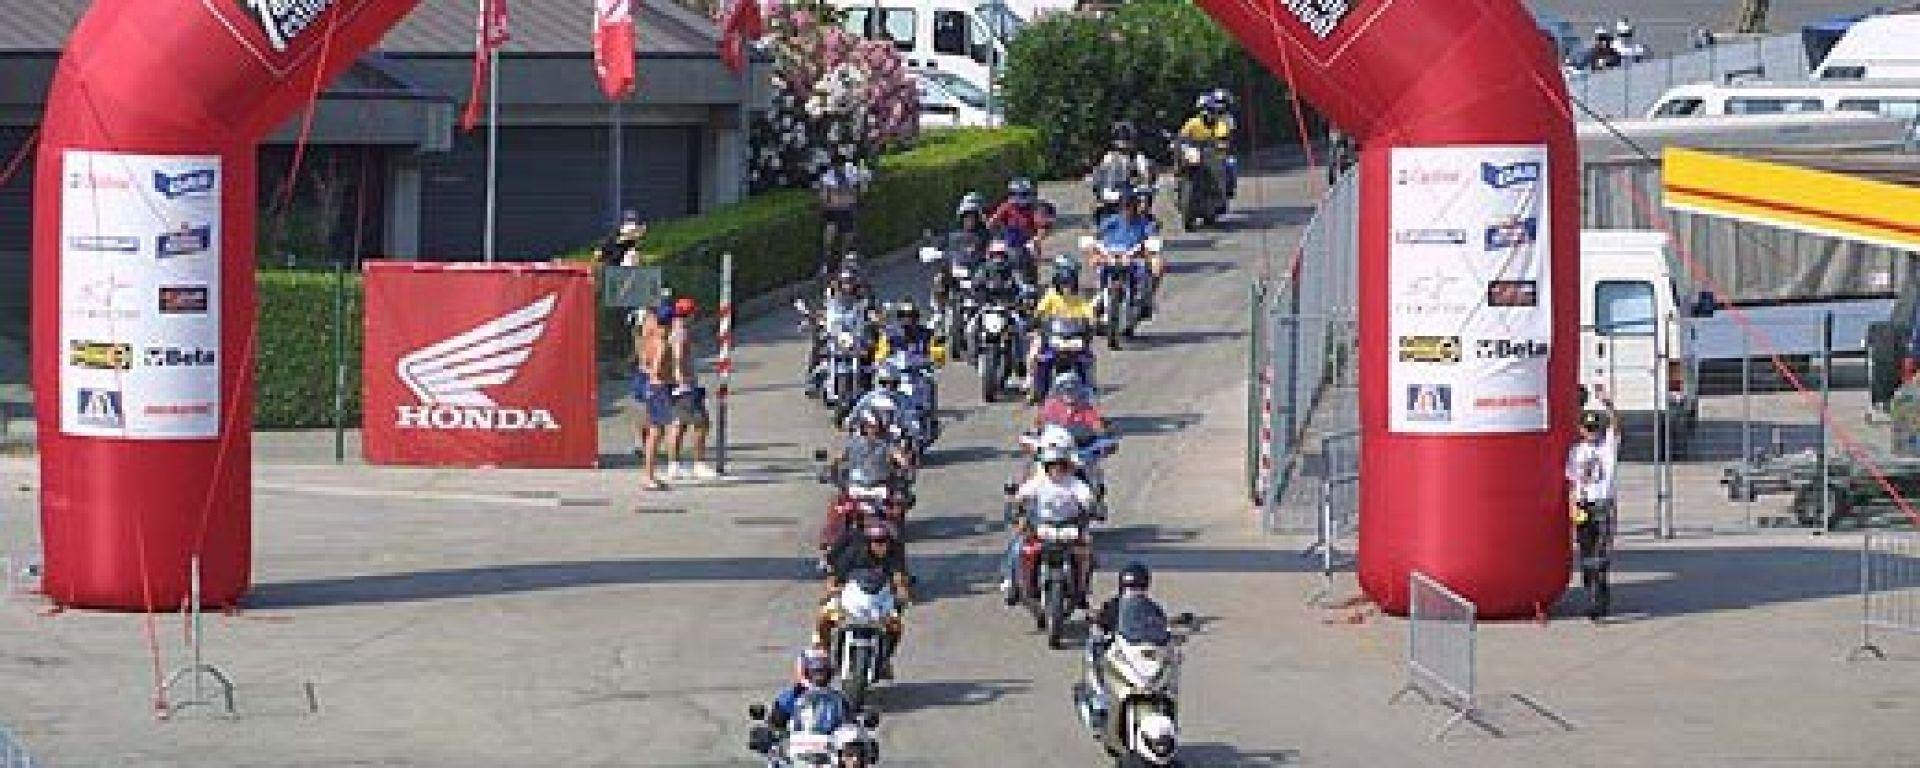 HONDA FESTIVAL: Appuntamento a Monza